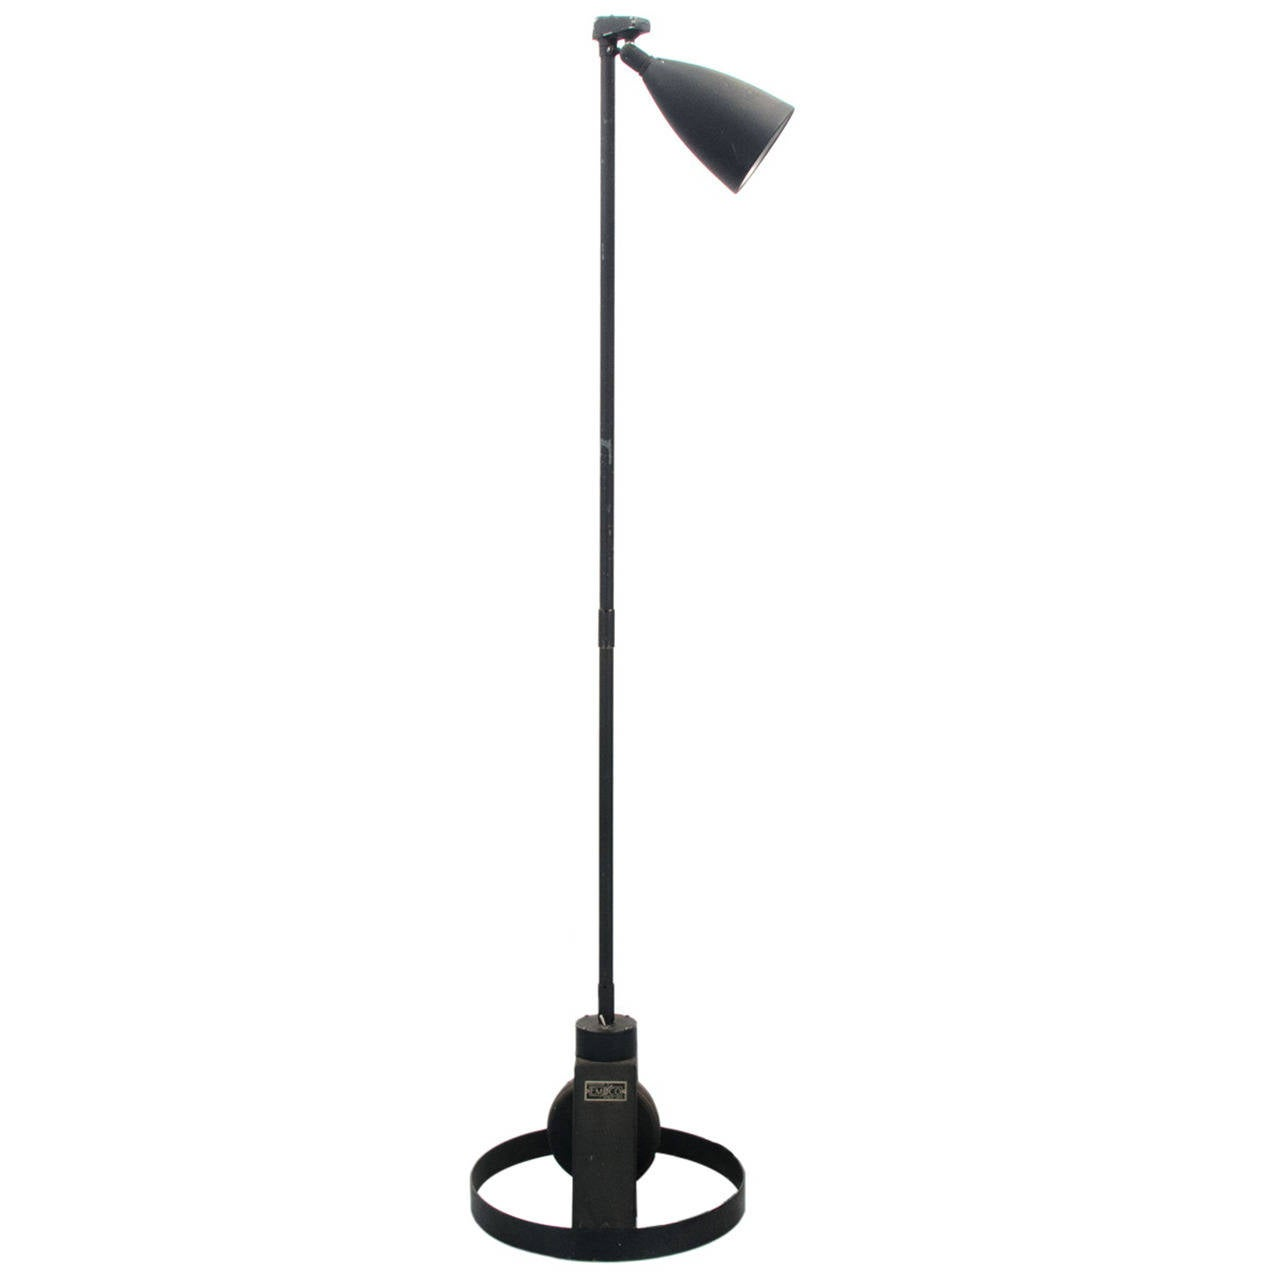 Minimalist Industrial Floor Lamp For Sale At 1stdibs